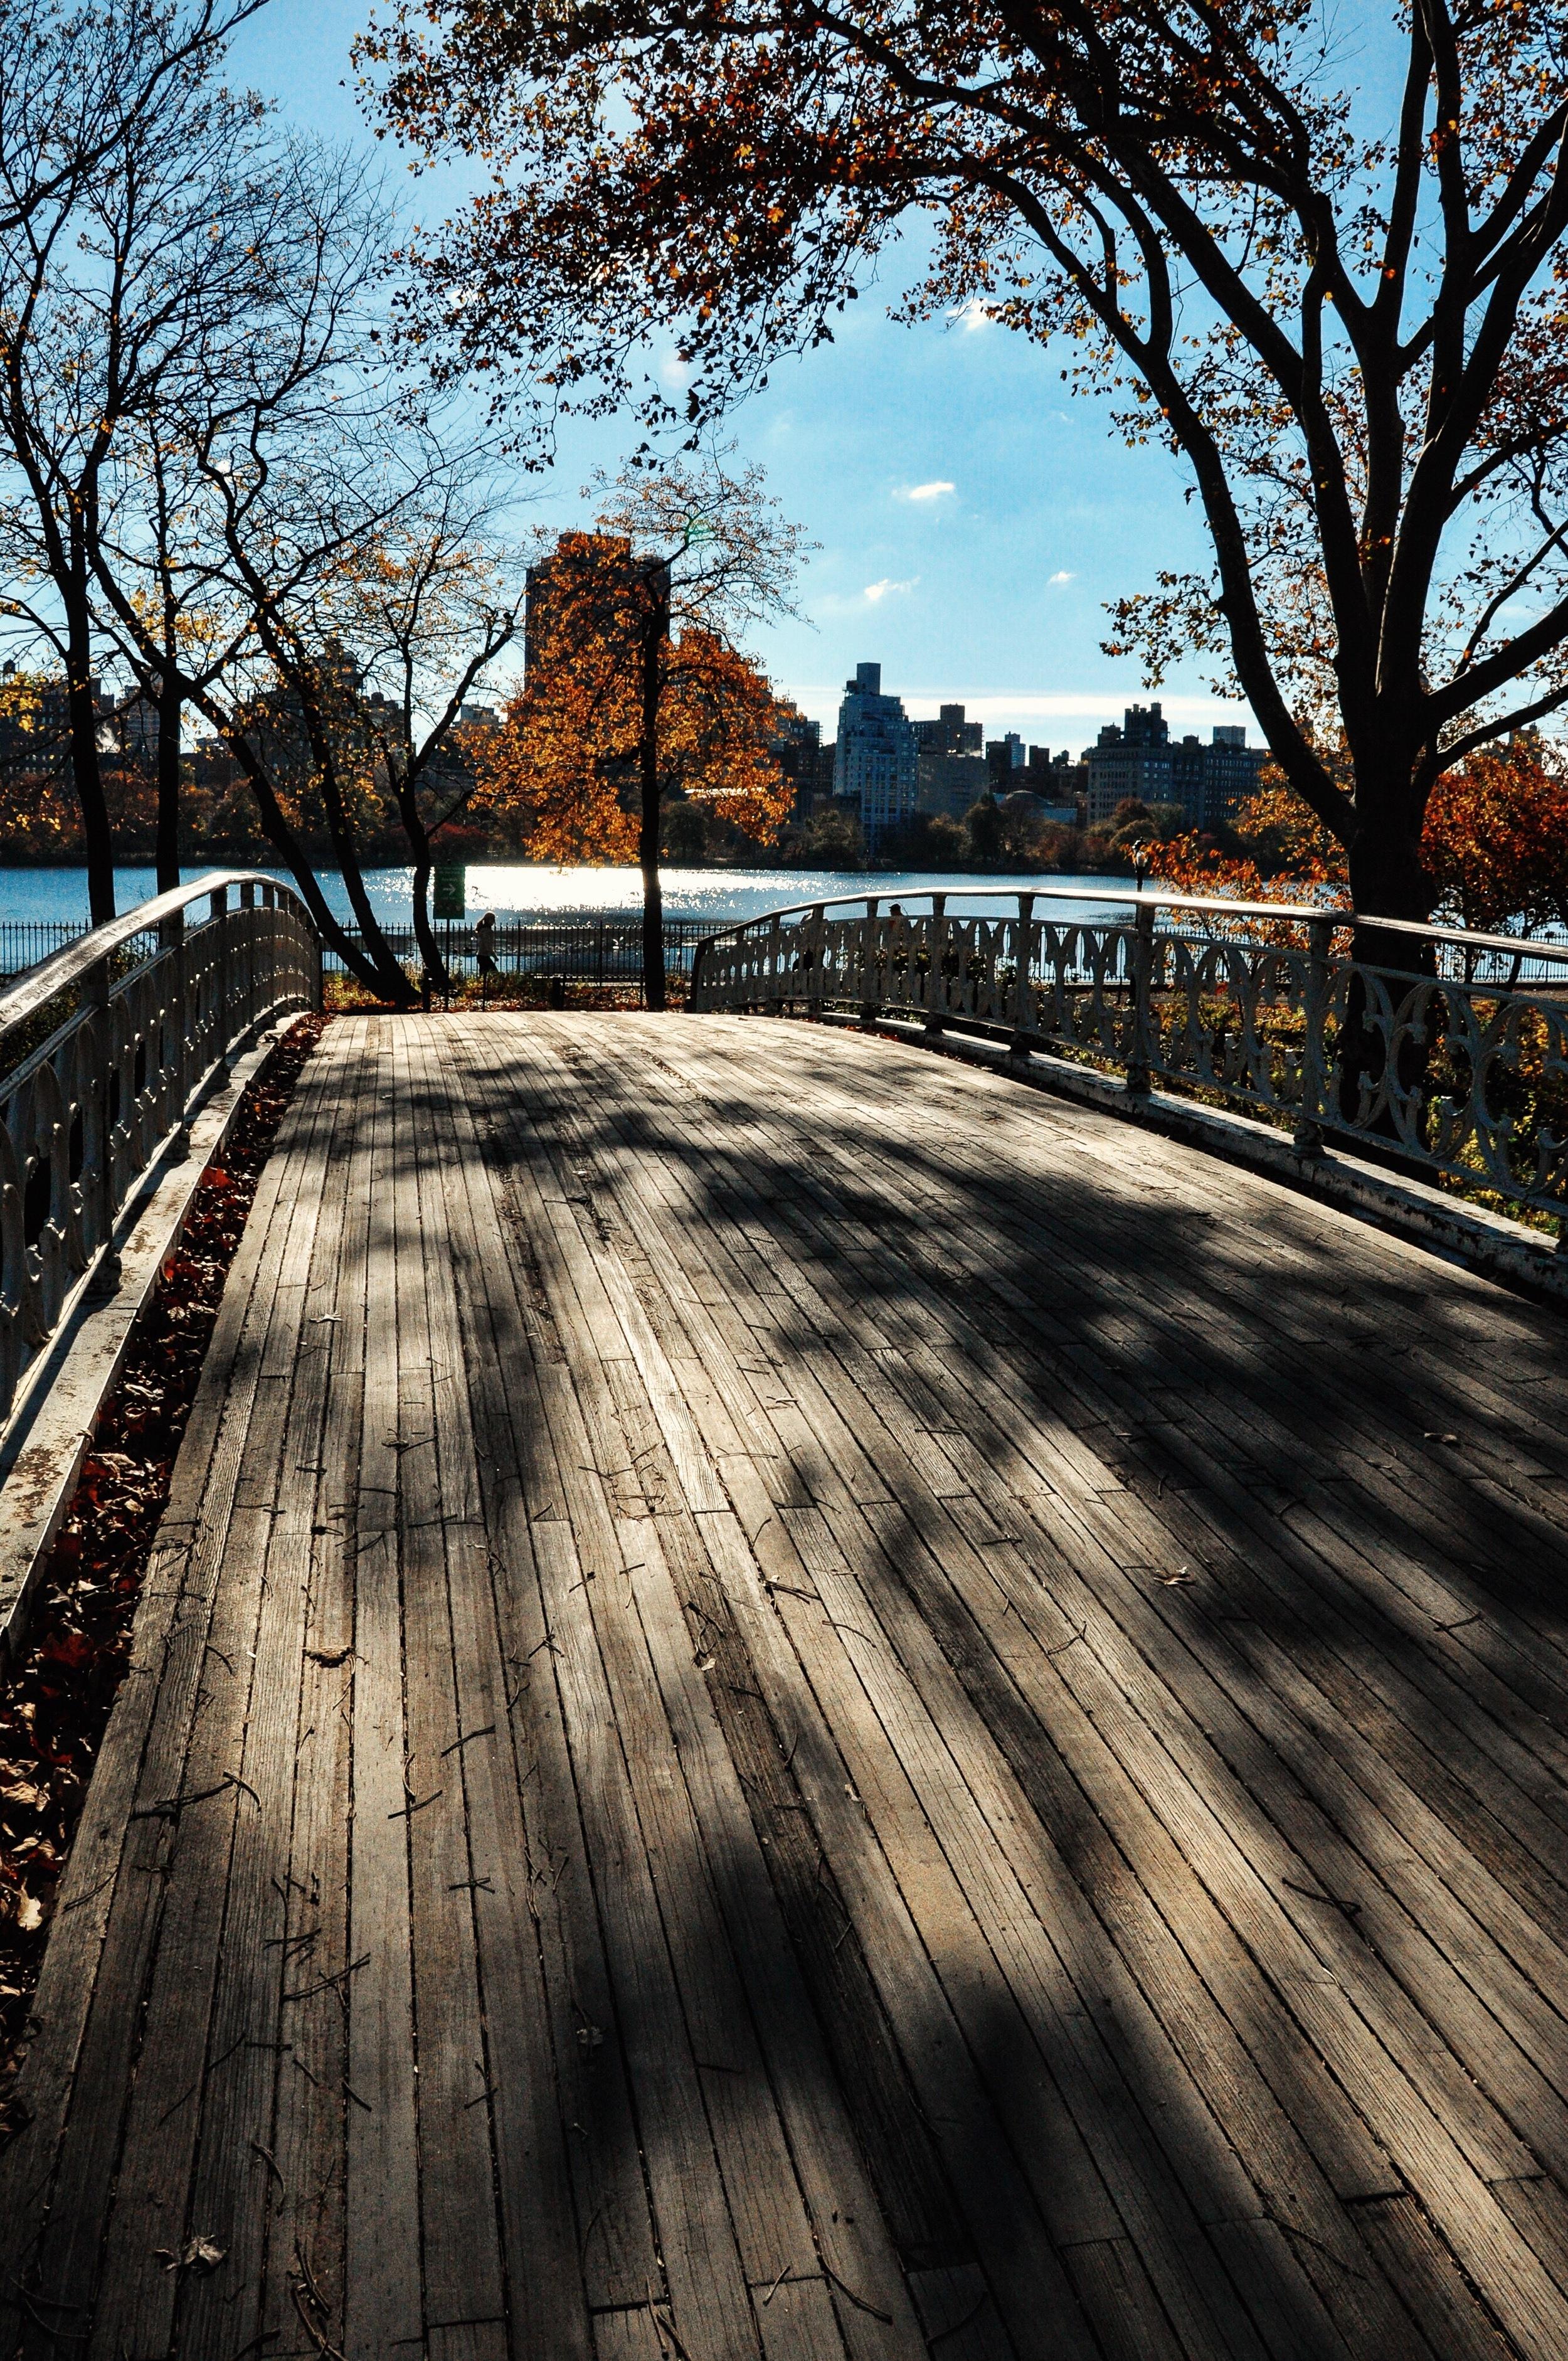 @ @ @ Gothc Bridge_Bridge No. 28_Reservoir Area_Central Park copy.jpg.JPG